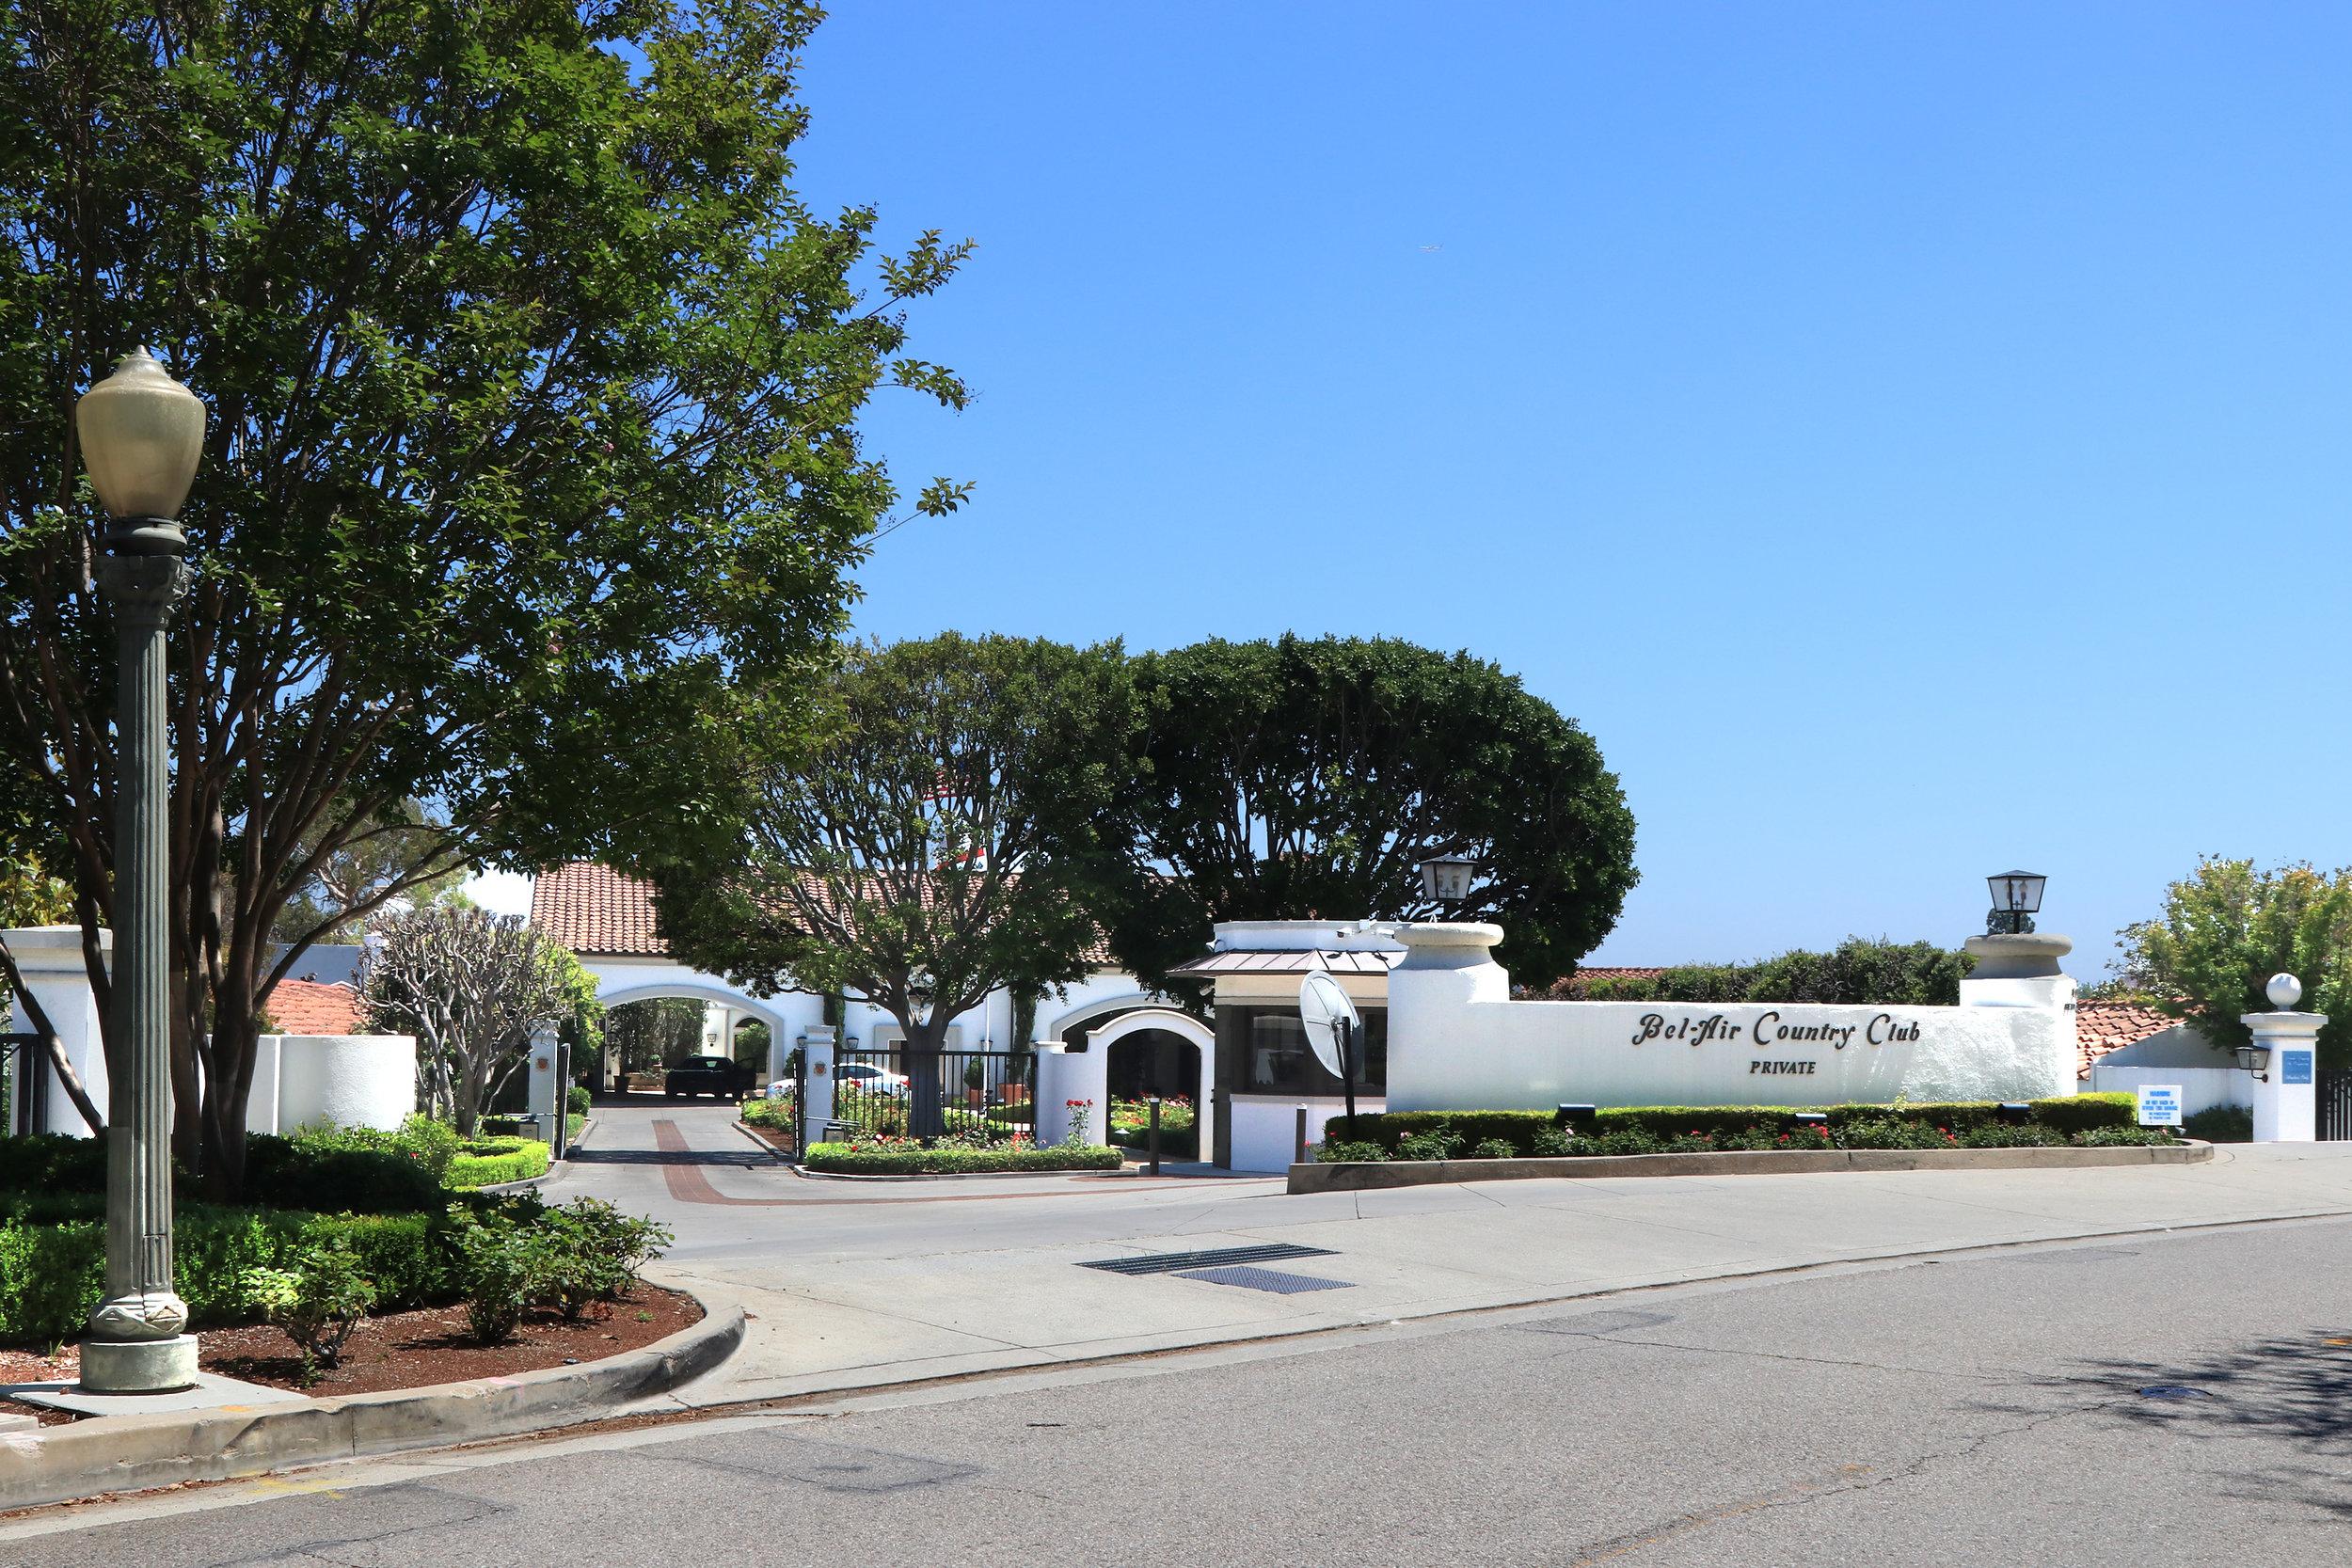 Bel-Air Country Club